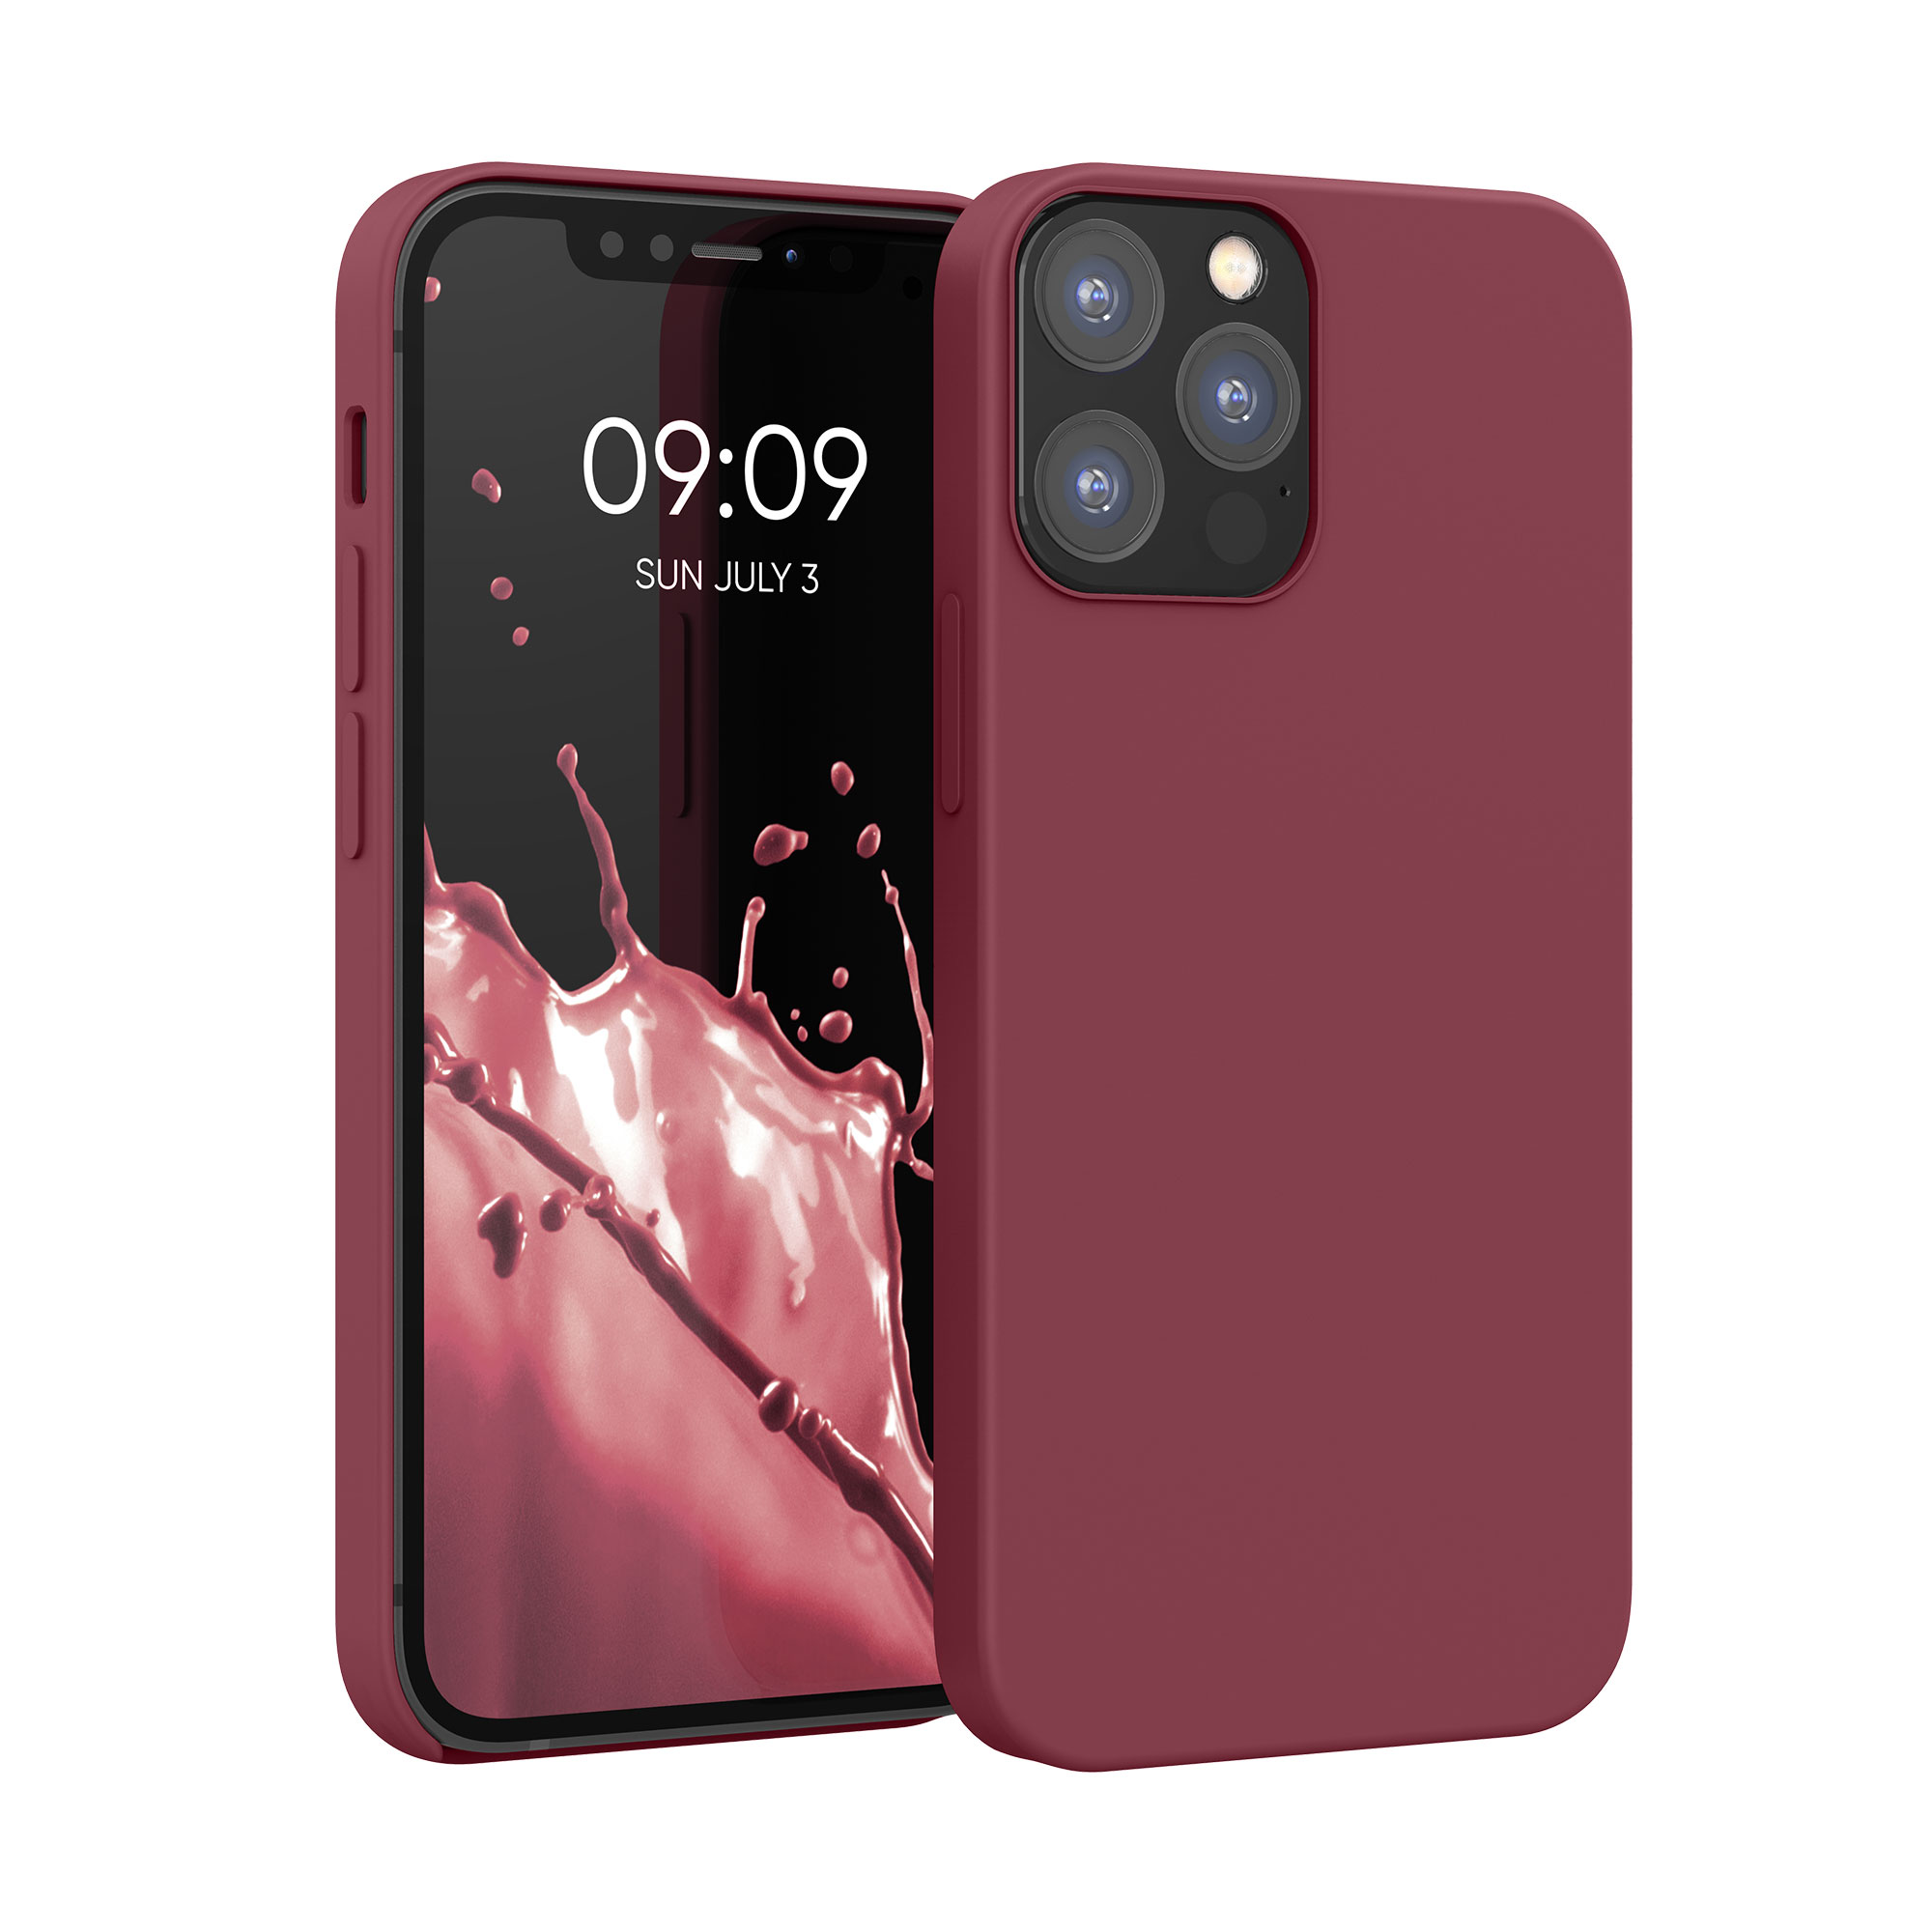 Kvalitní silikonové TPU pouzdro pro Apple iPhone 12 / 12 Pro - rebarbora Red